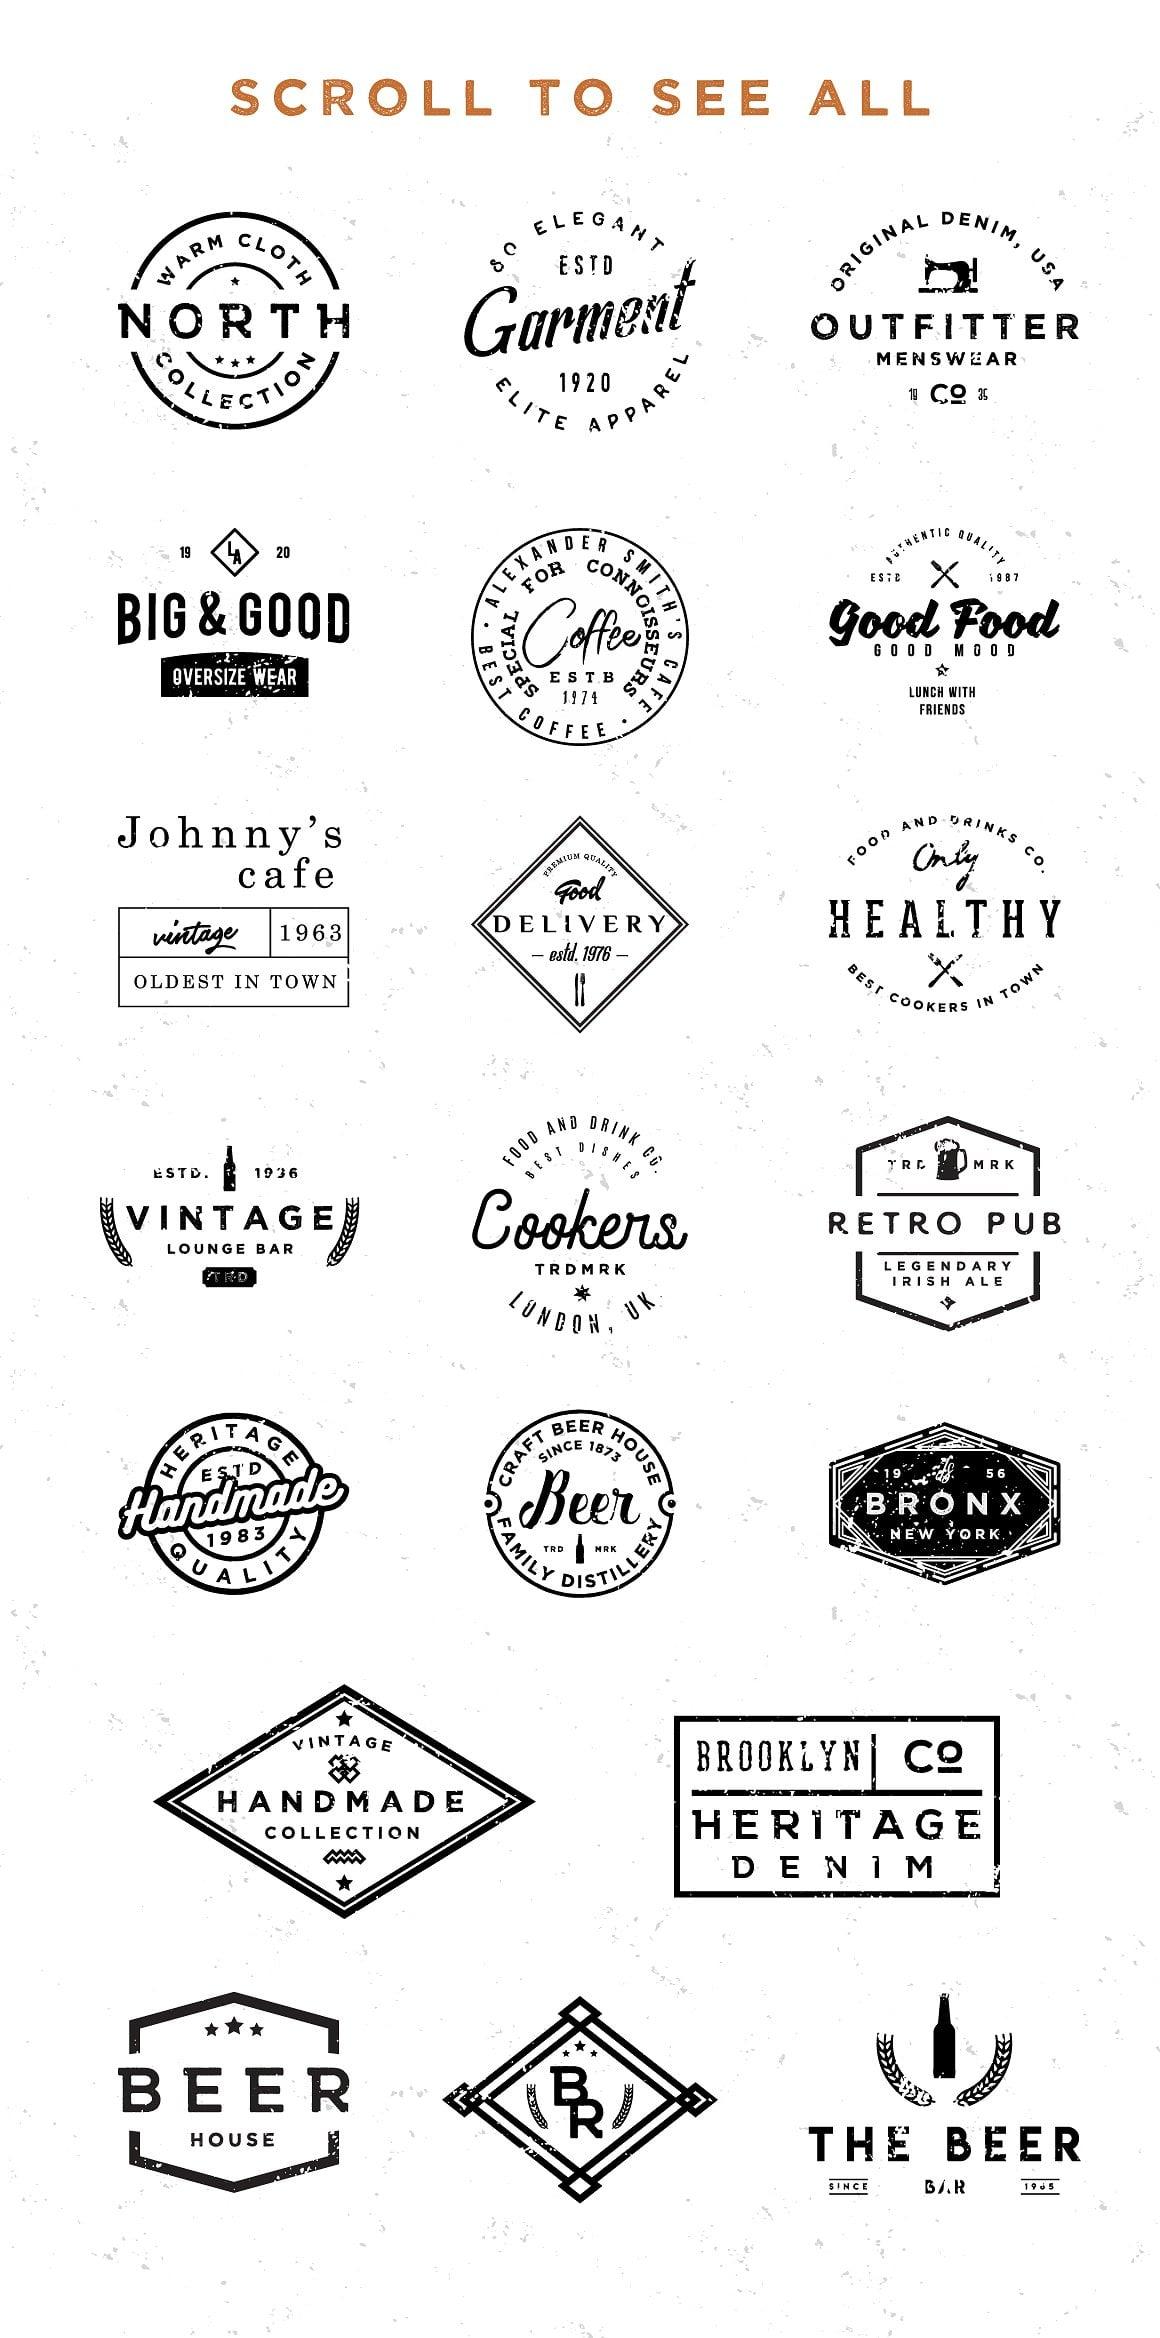 100 Vintage Stock Logo Templates - Only $24! - jpg